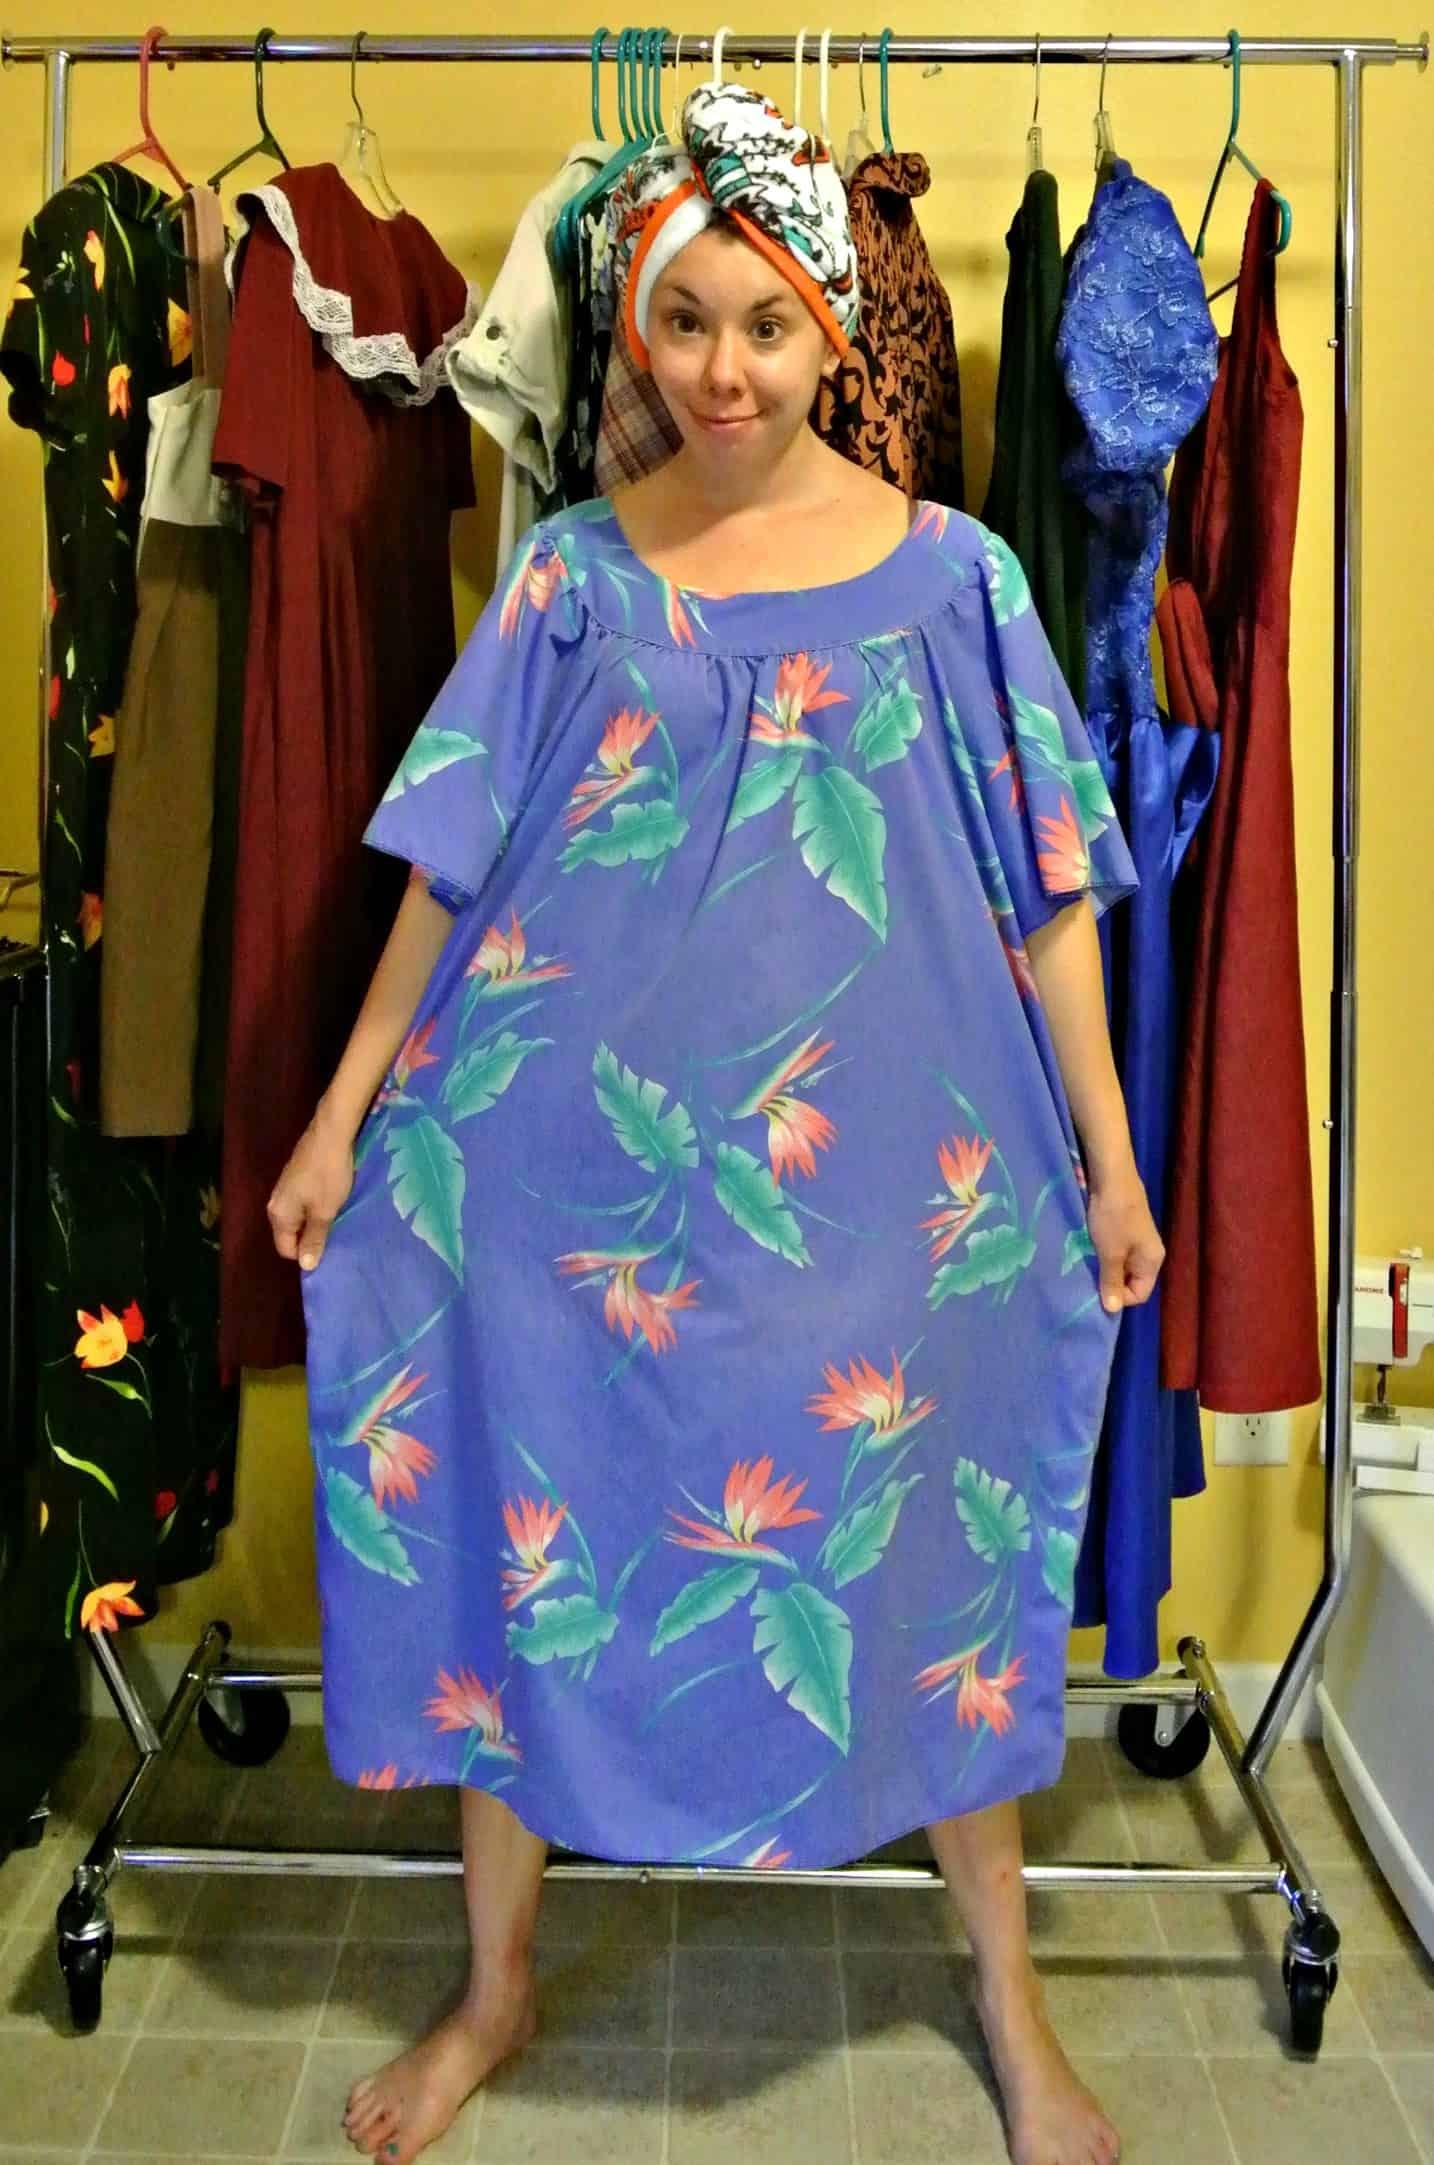 From Muumuu To Wrap Dress Refashionista